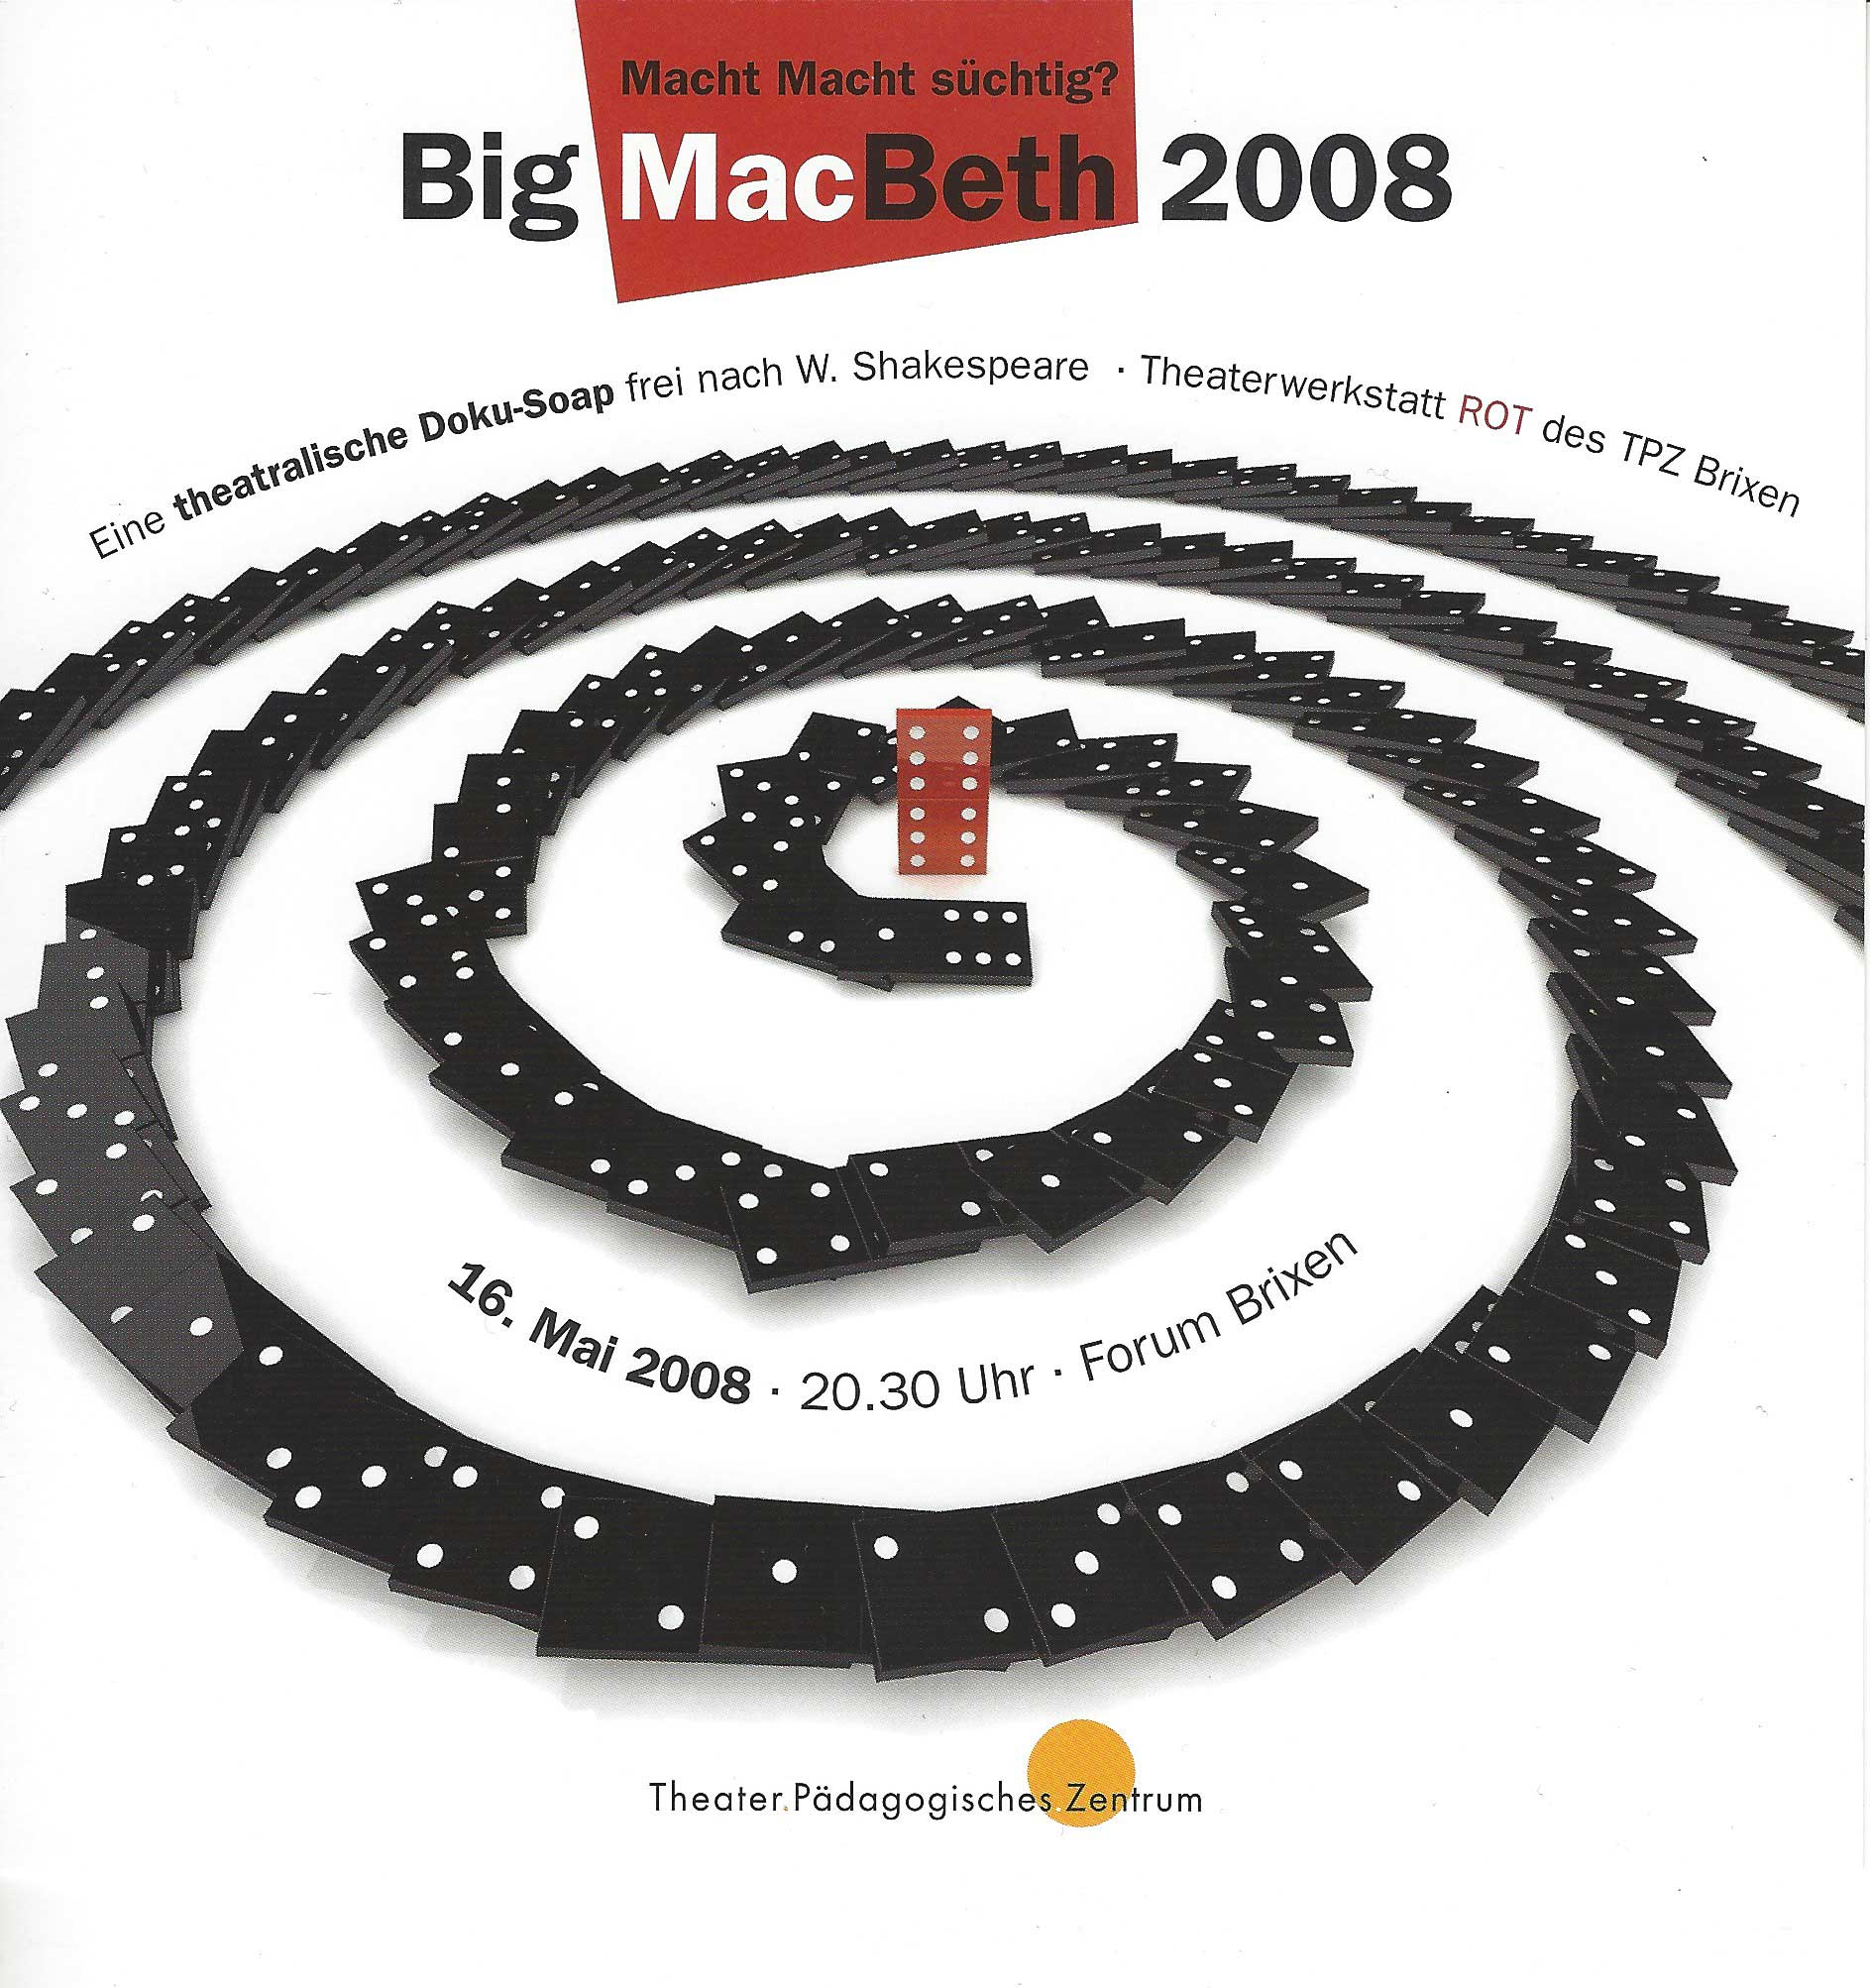 2008-rot-Big-Macbeth-2008-Plakat-web.jpg